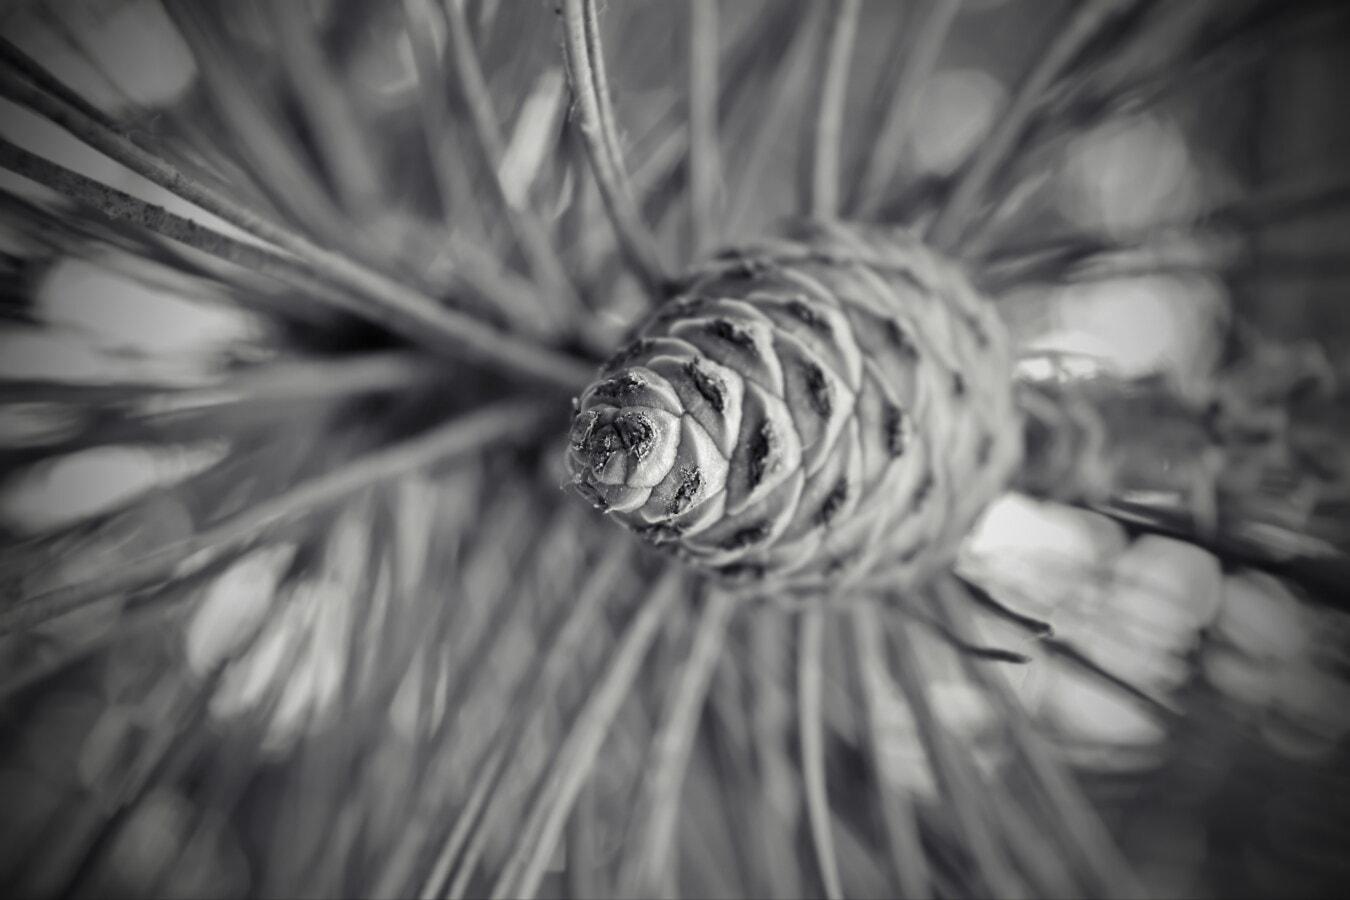 contacto directo, coníferas, blanco y negro, rama, naturaleza, monocromo, pino, árbol, difuminar, celebración